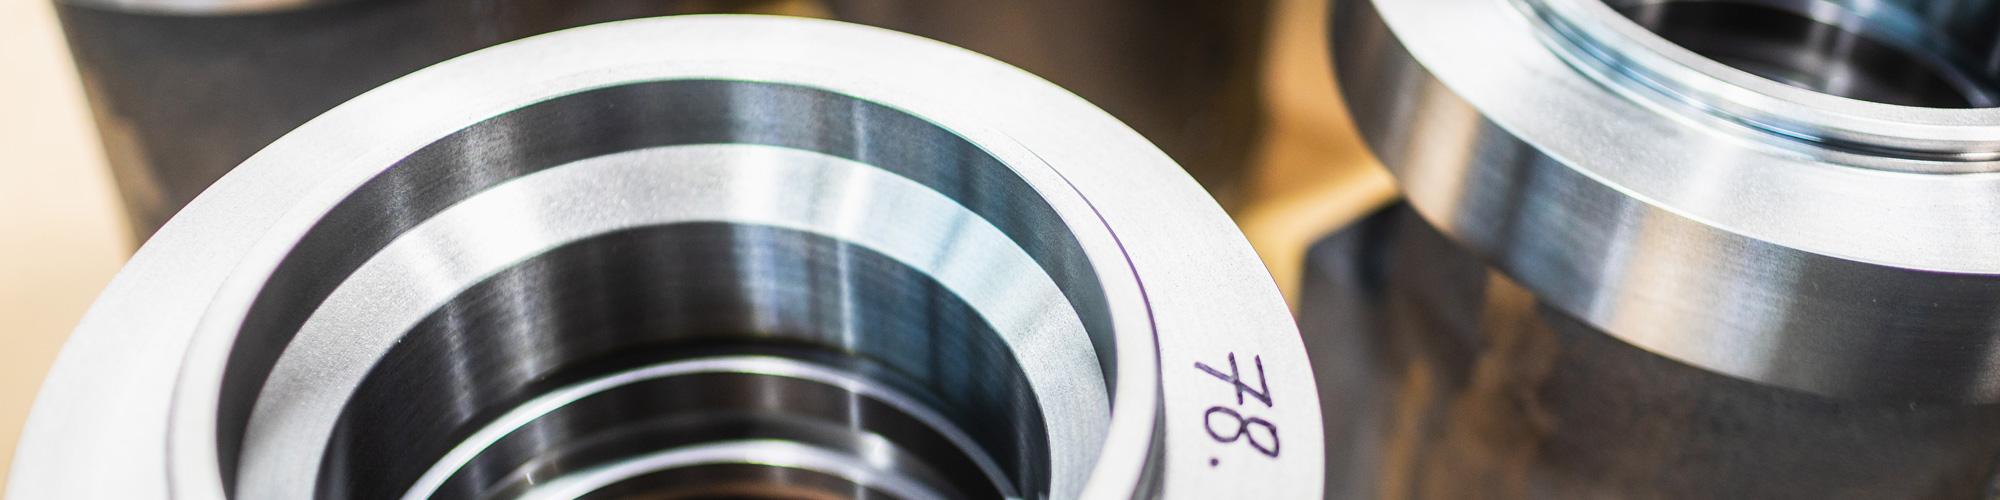 Geukes GmbH - Maschinenbau - Gussbearbeitung ADI